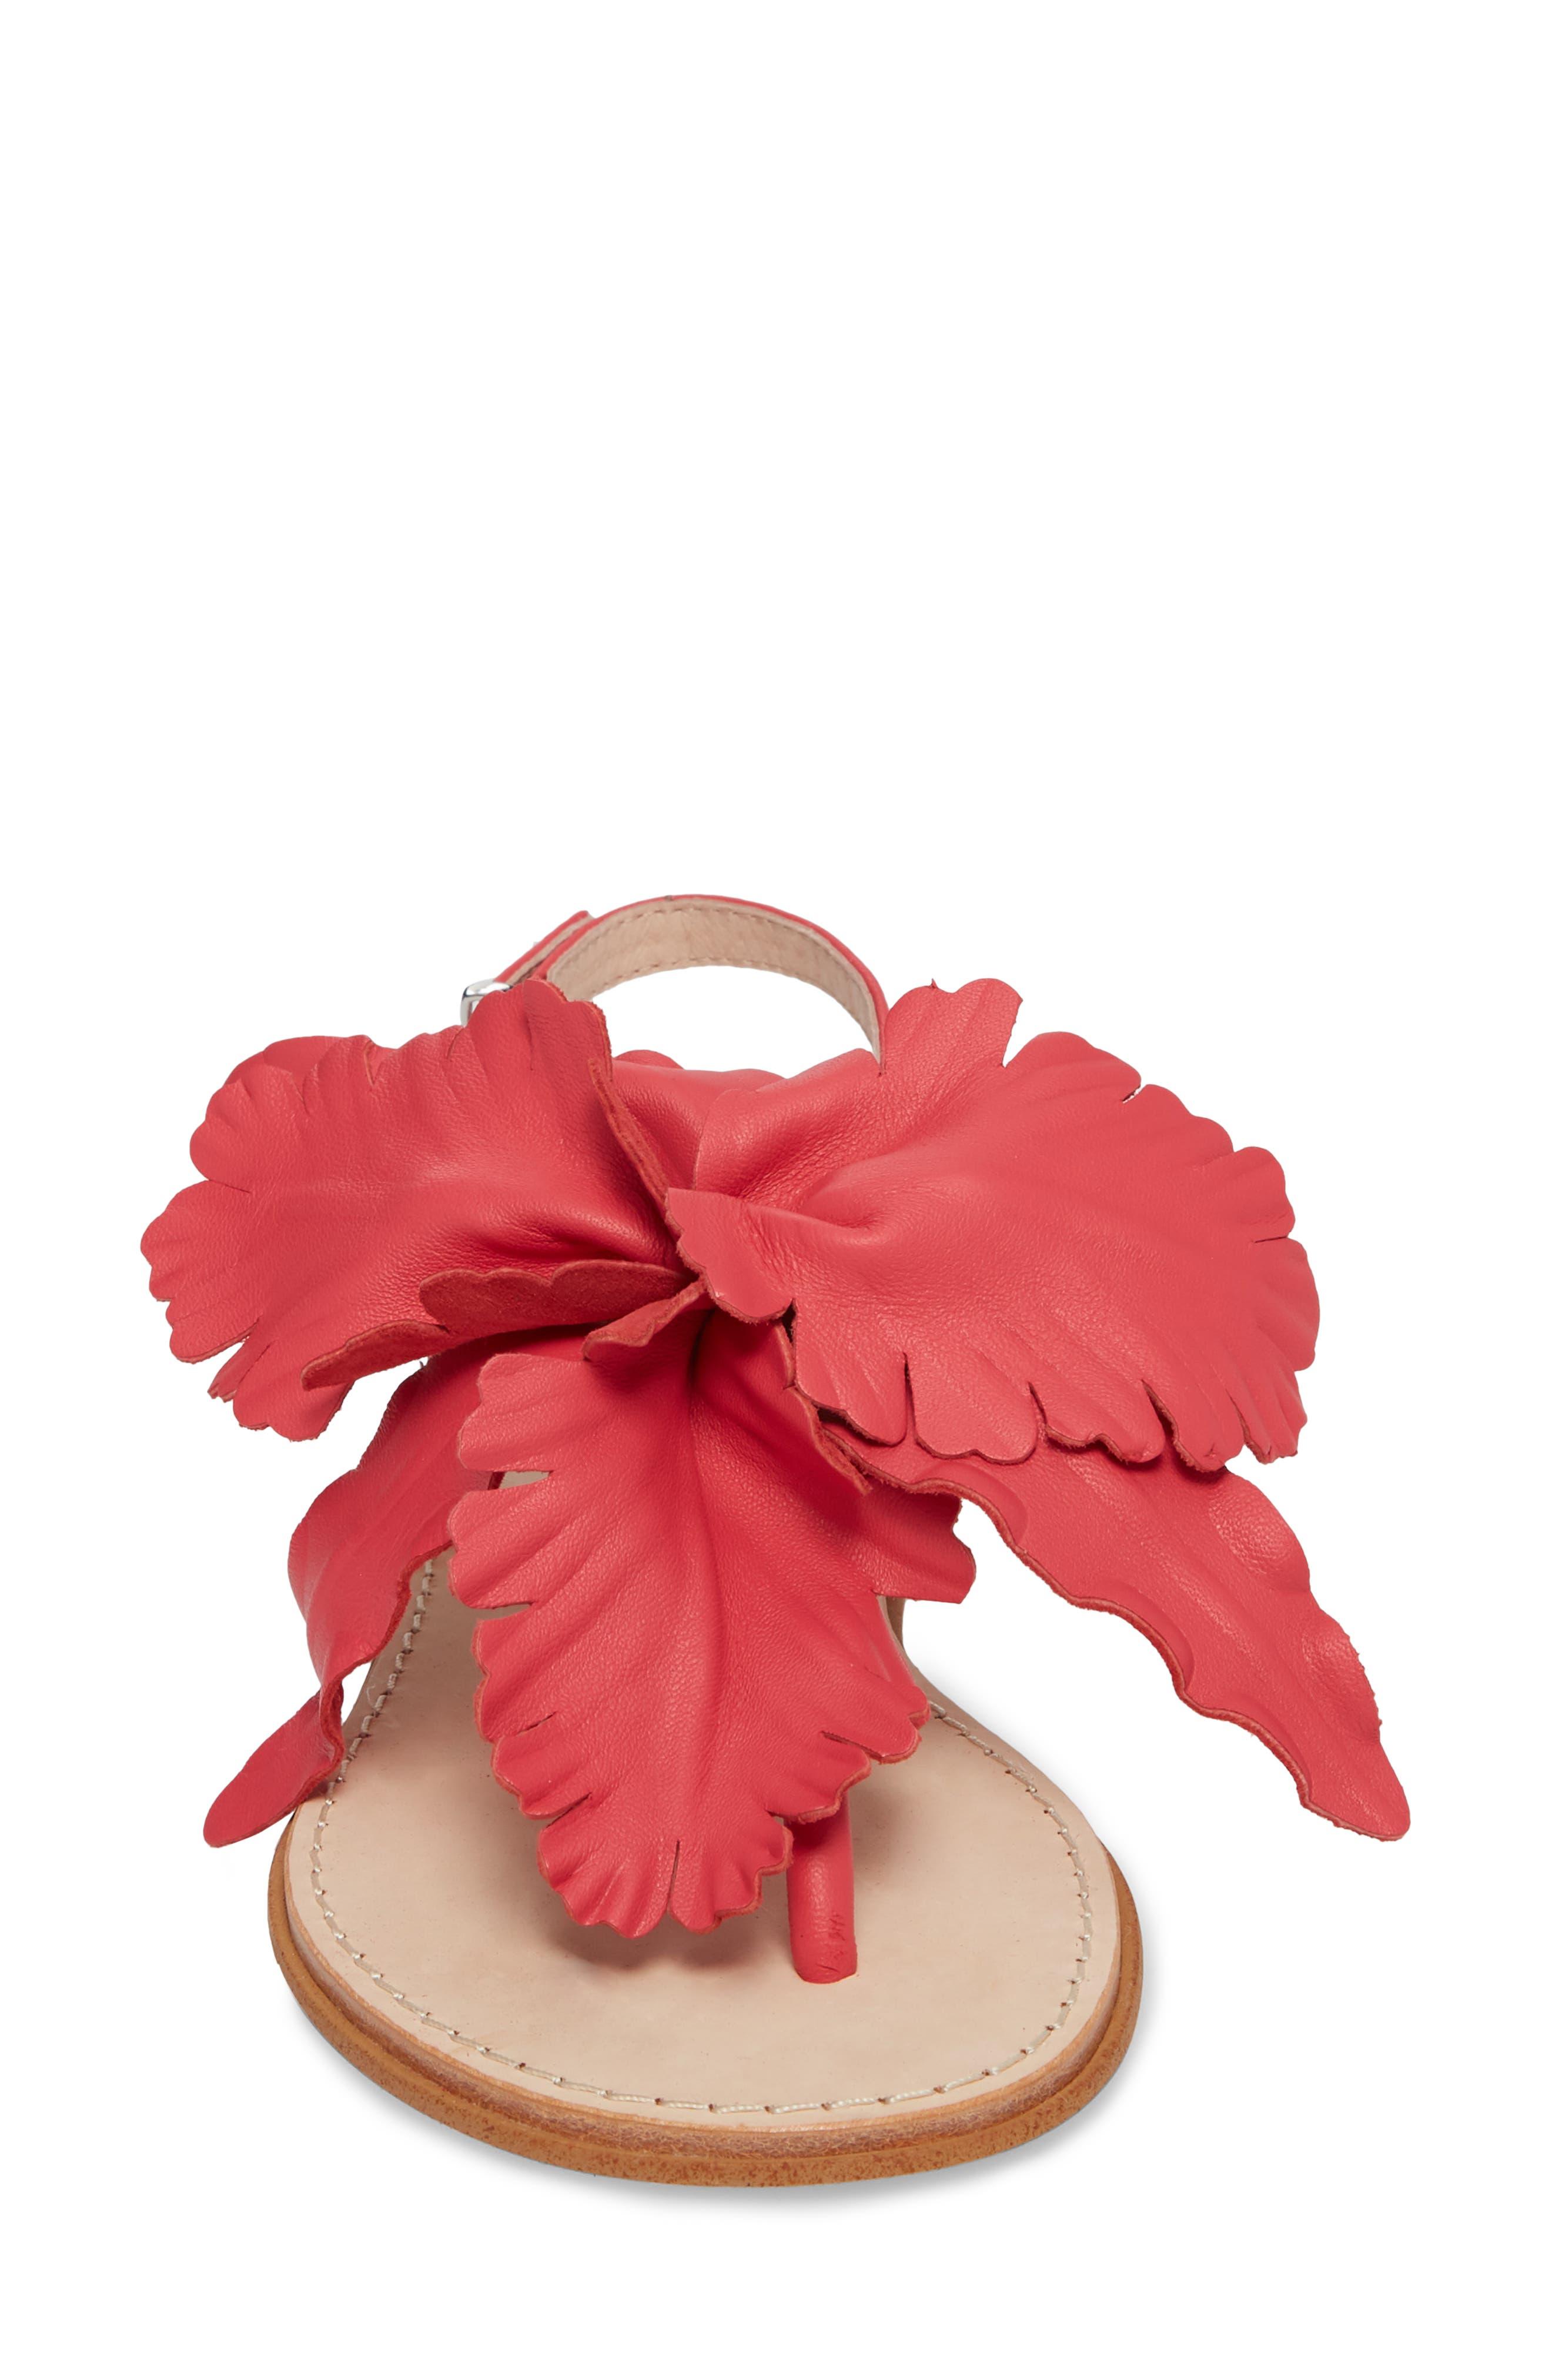 Peony Sandal,                             Alternate thumbnail 4, color,                             Fuchsia Leather